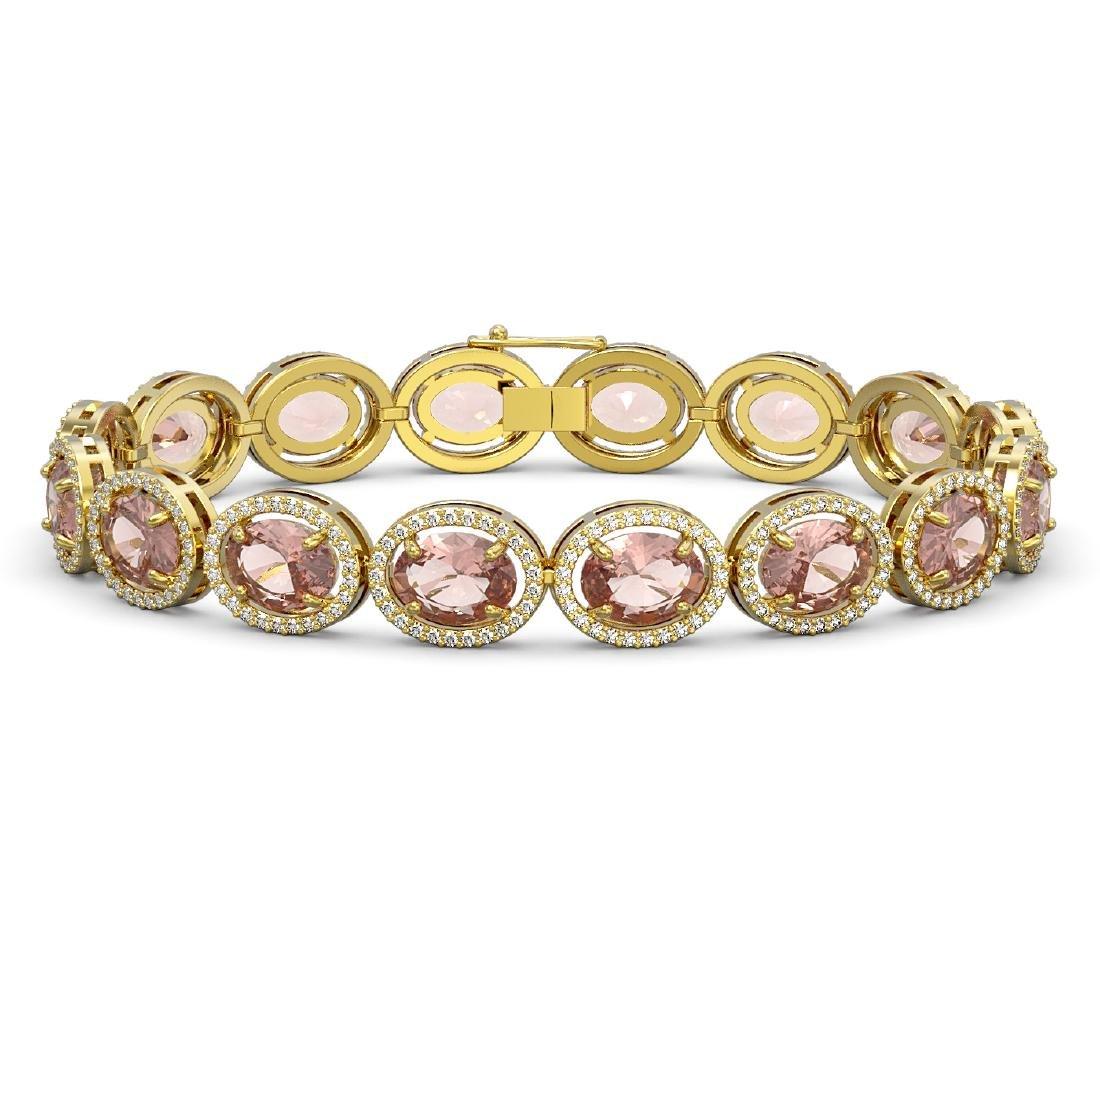 22.8 CTW Morganite & Diamond Halo Bracelet 10K Yellow